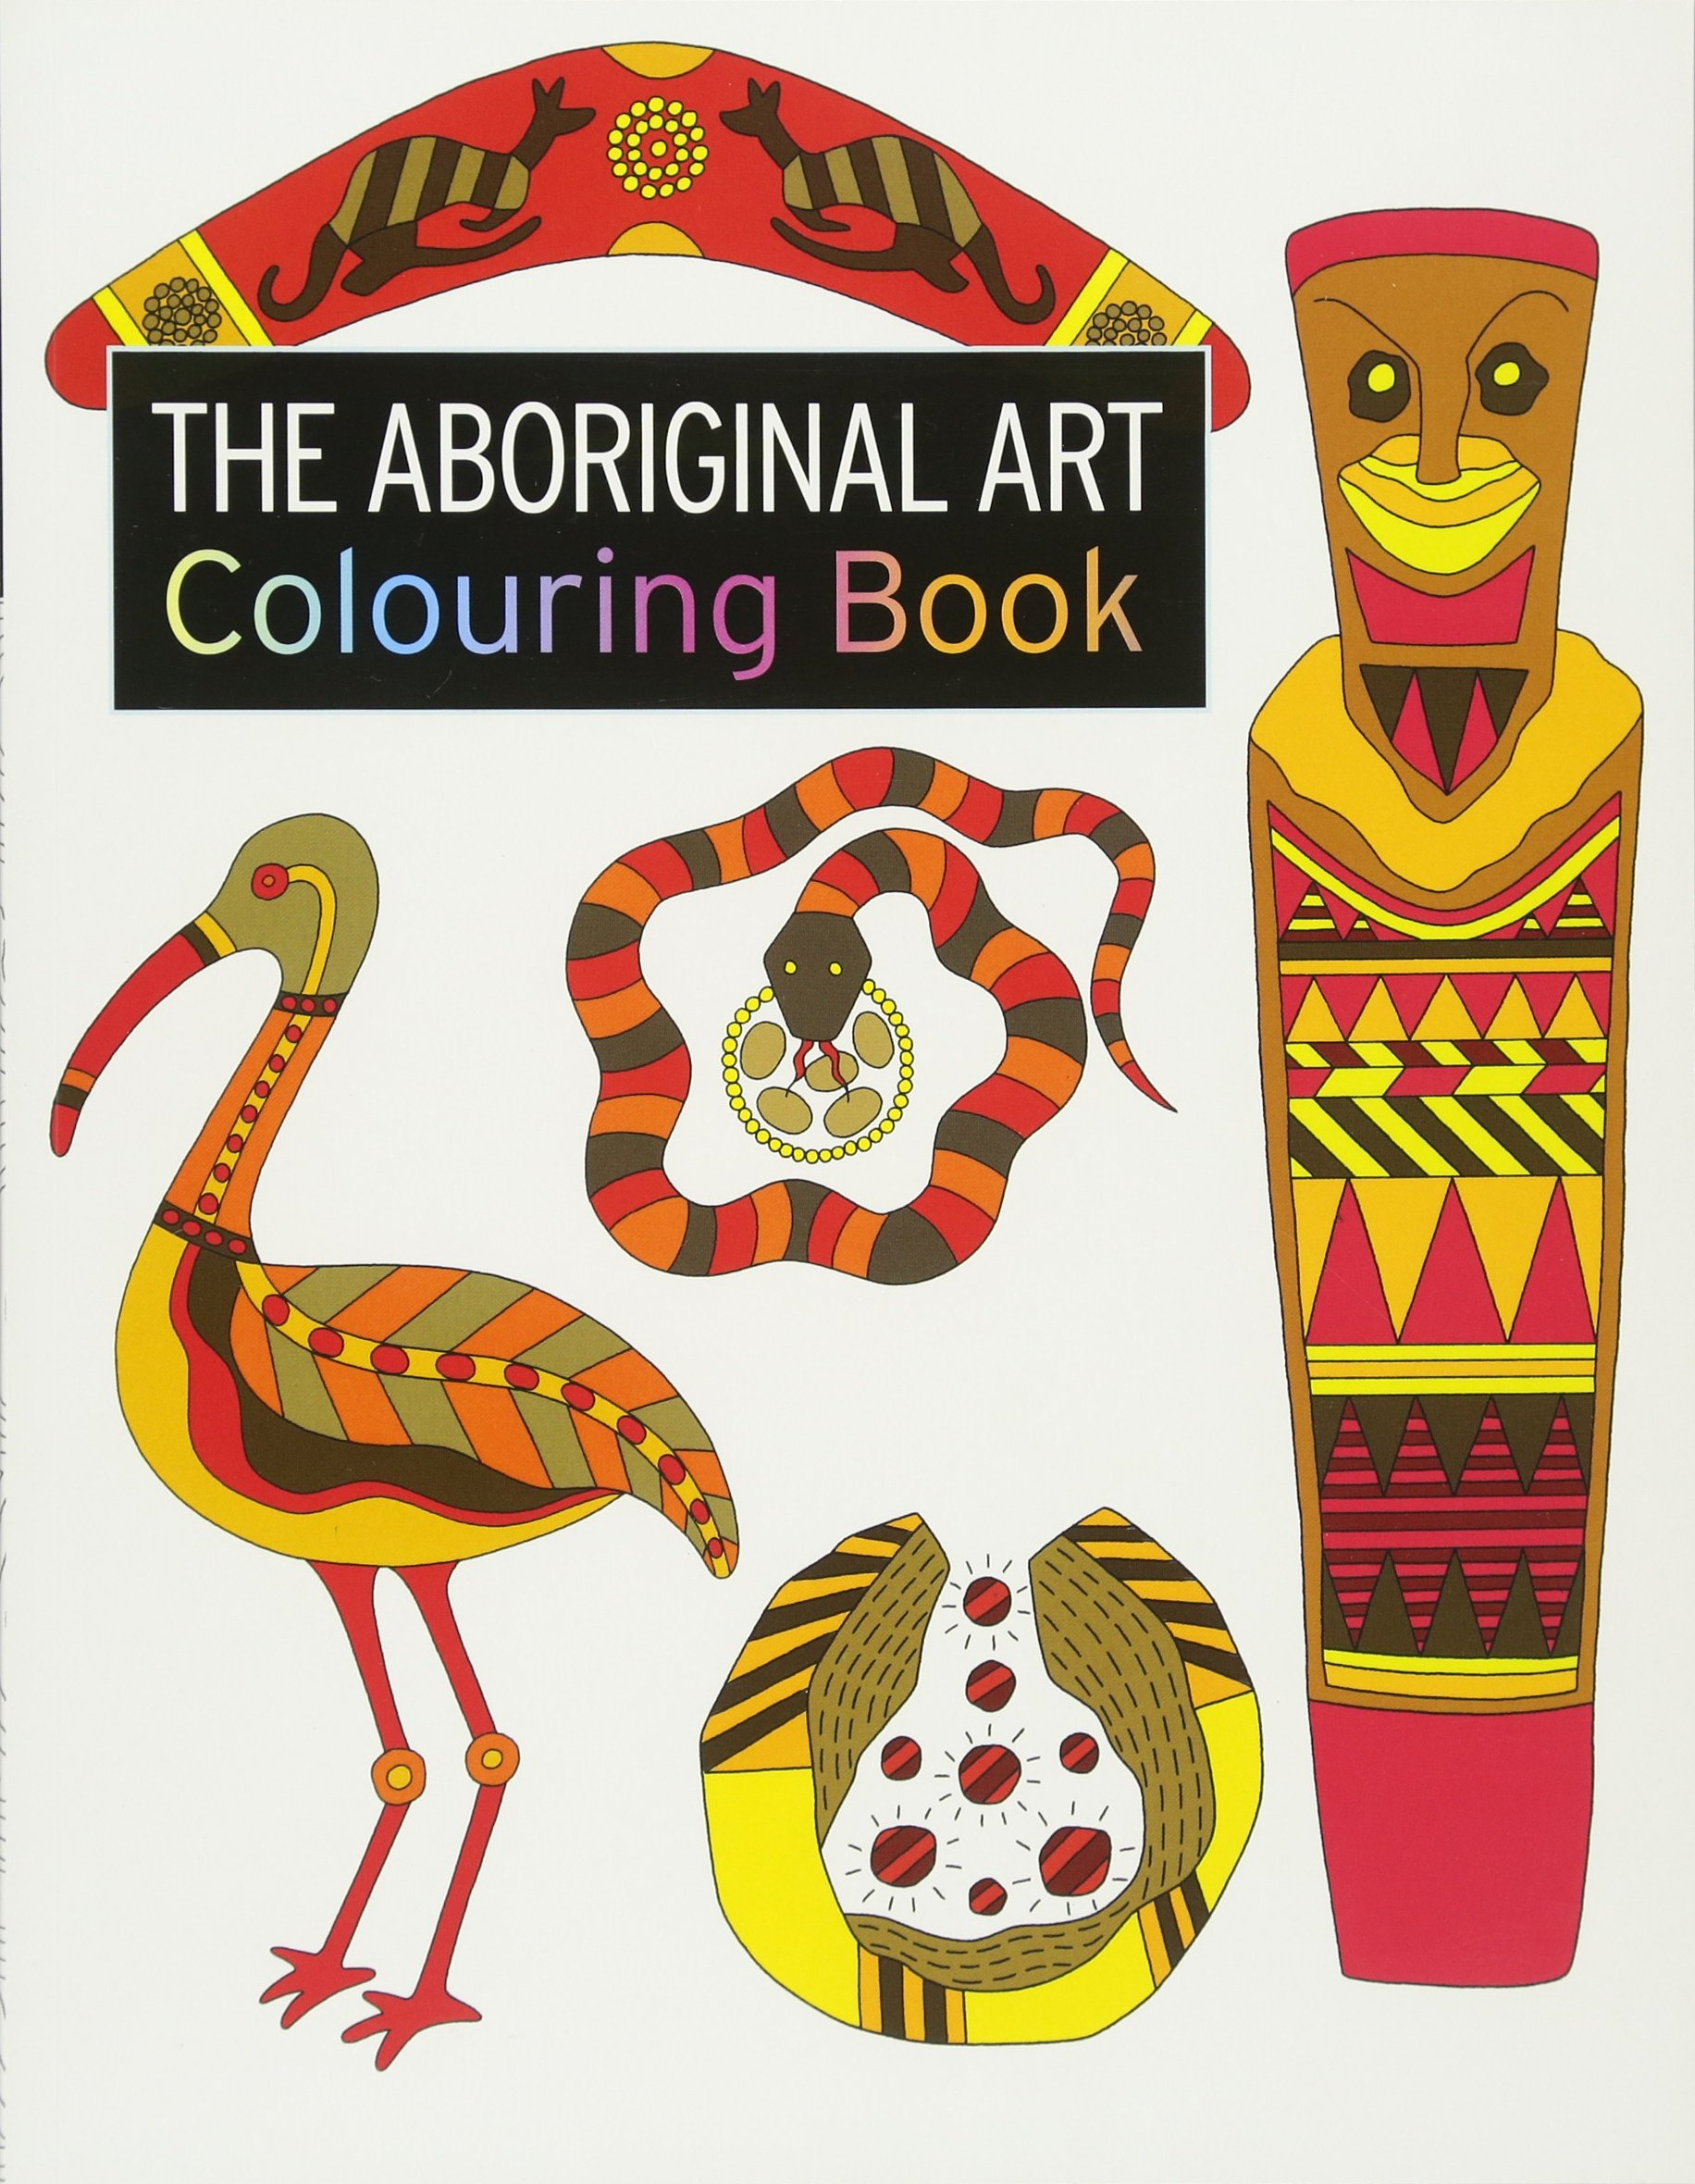 the aboriginal art colouring book the colouring book series